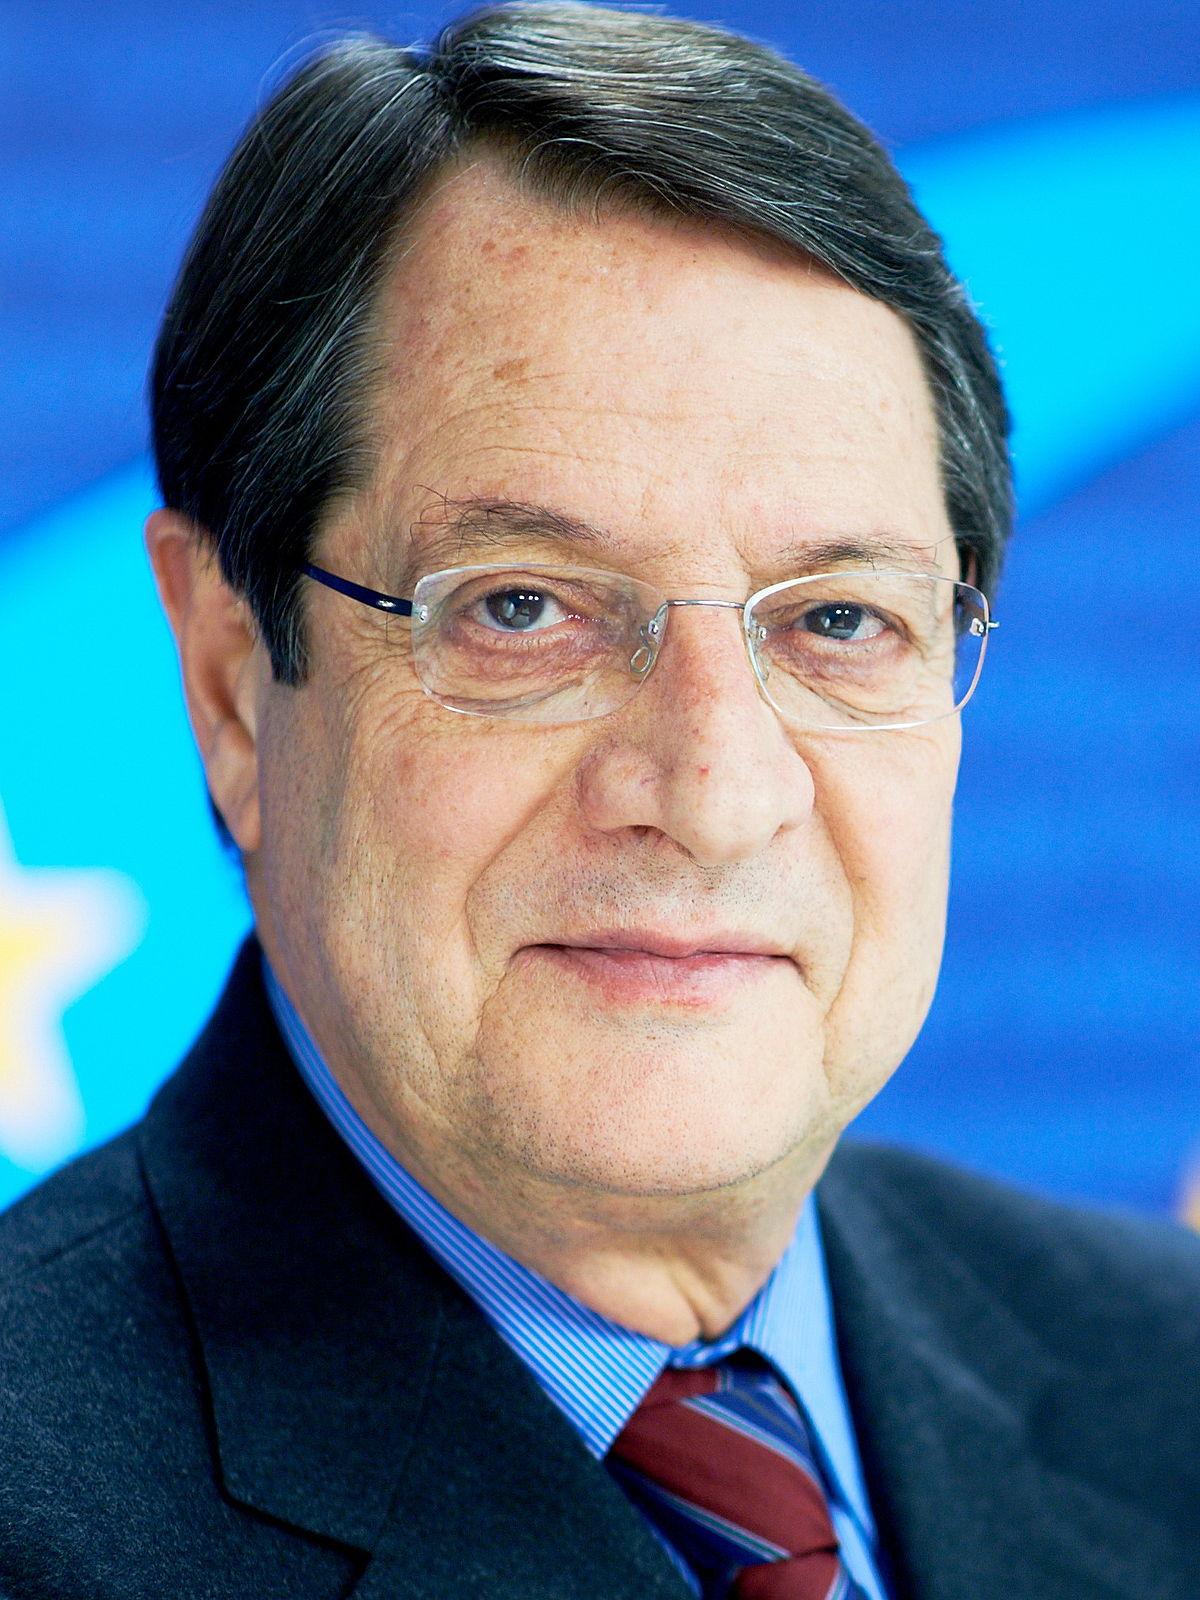 in-cipru-conservatorul-nicos-anastasiadis-a-fost-reales-presedinte-al-tarii